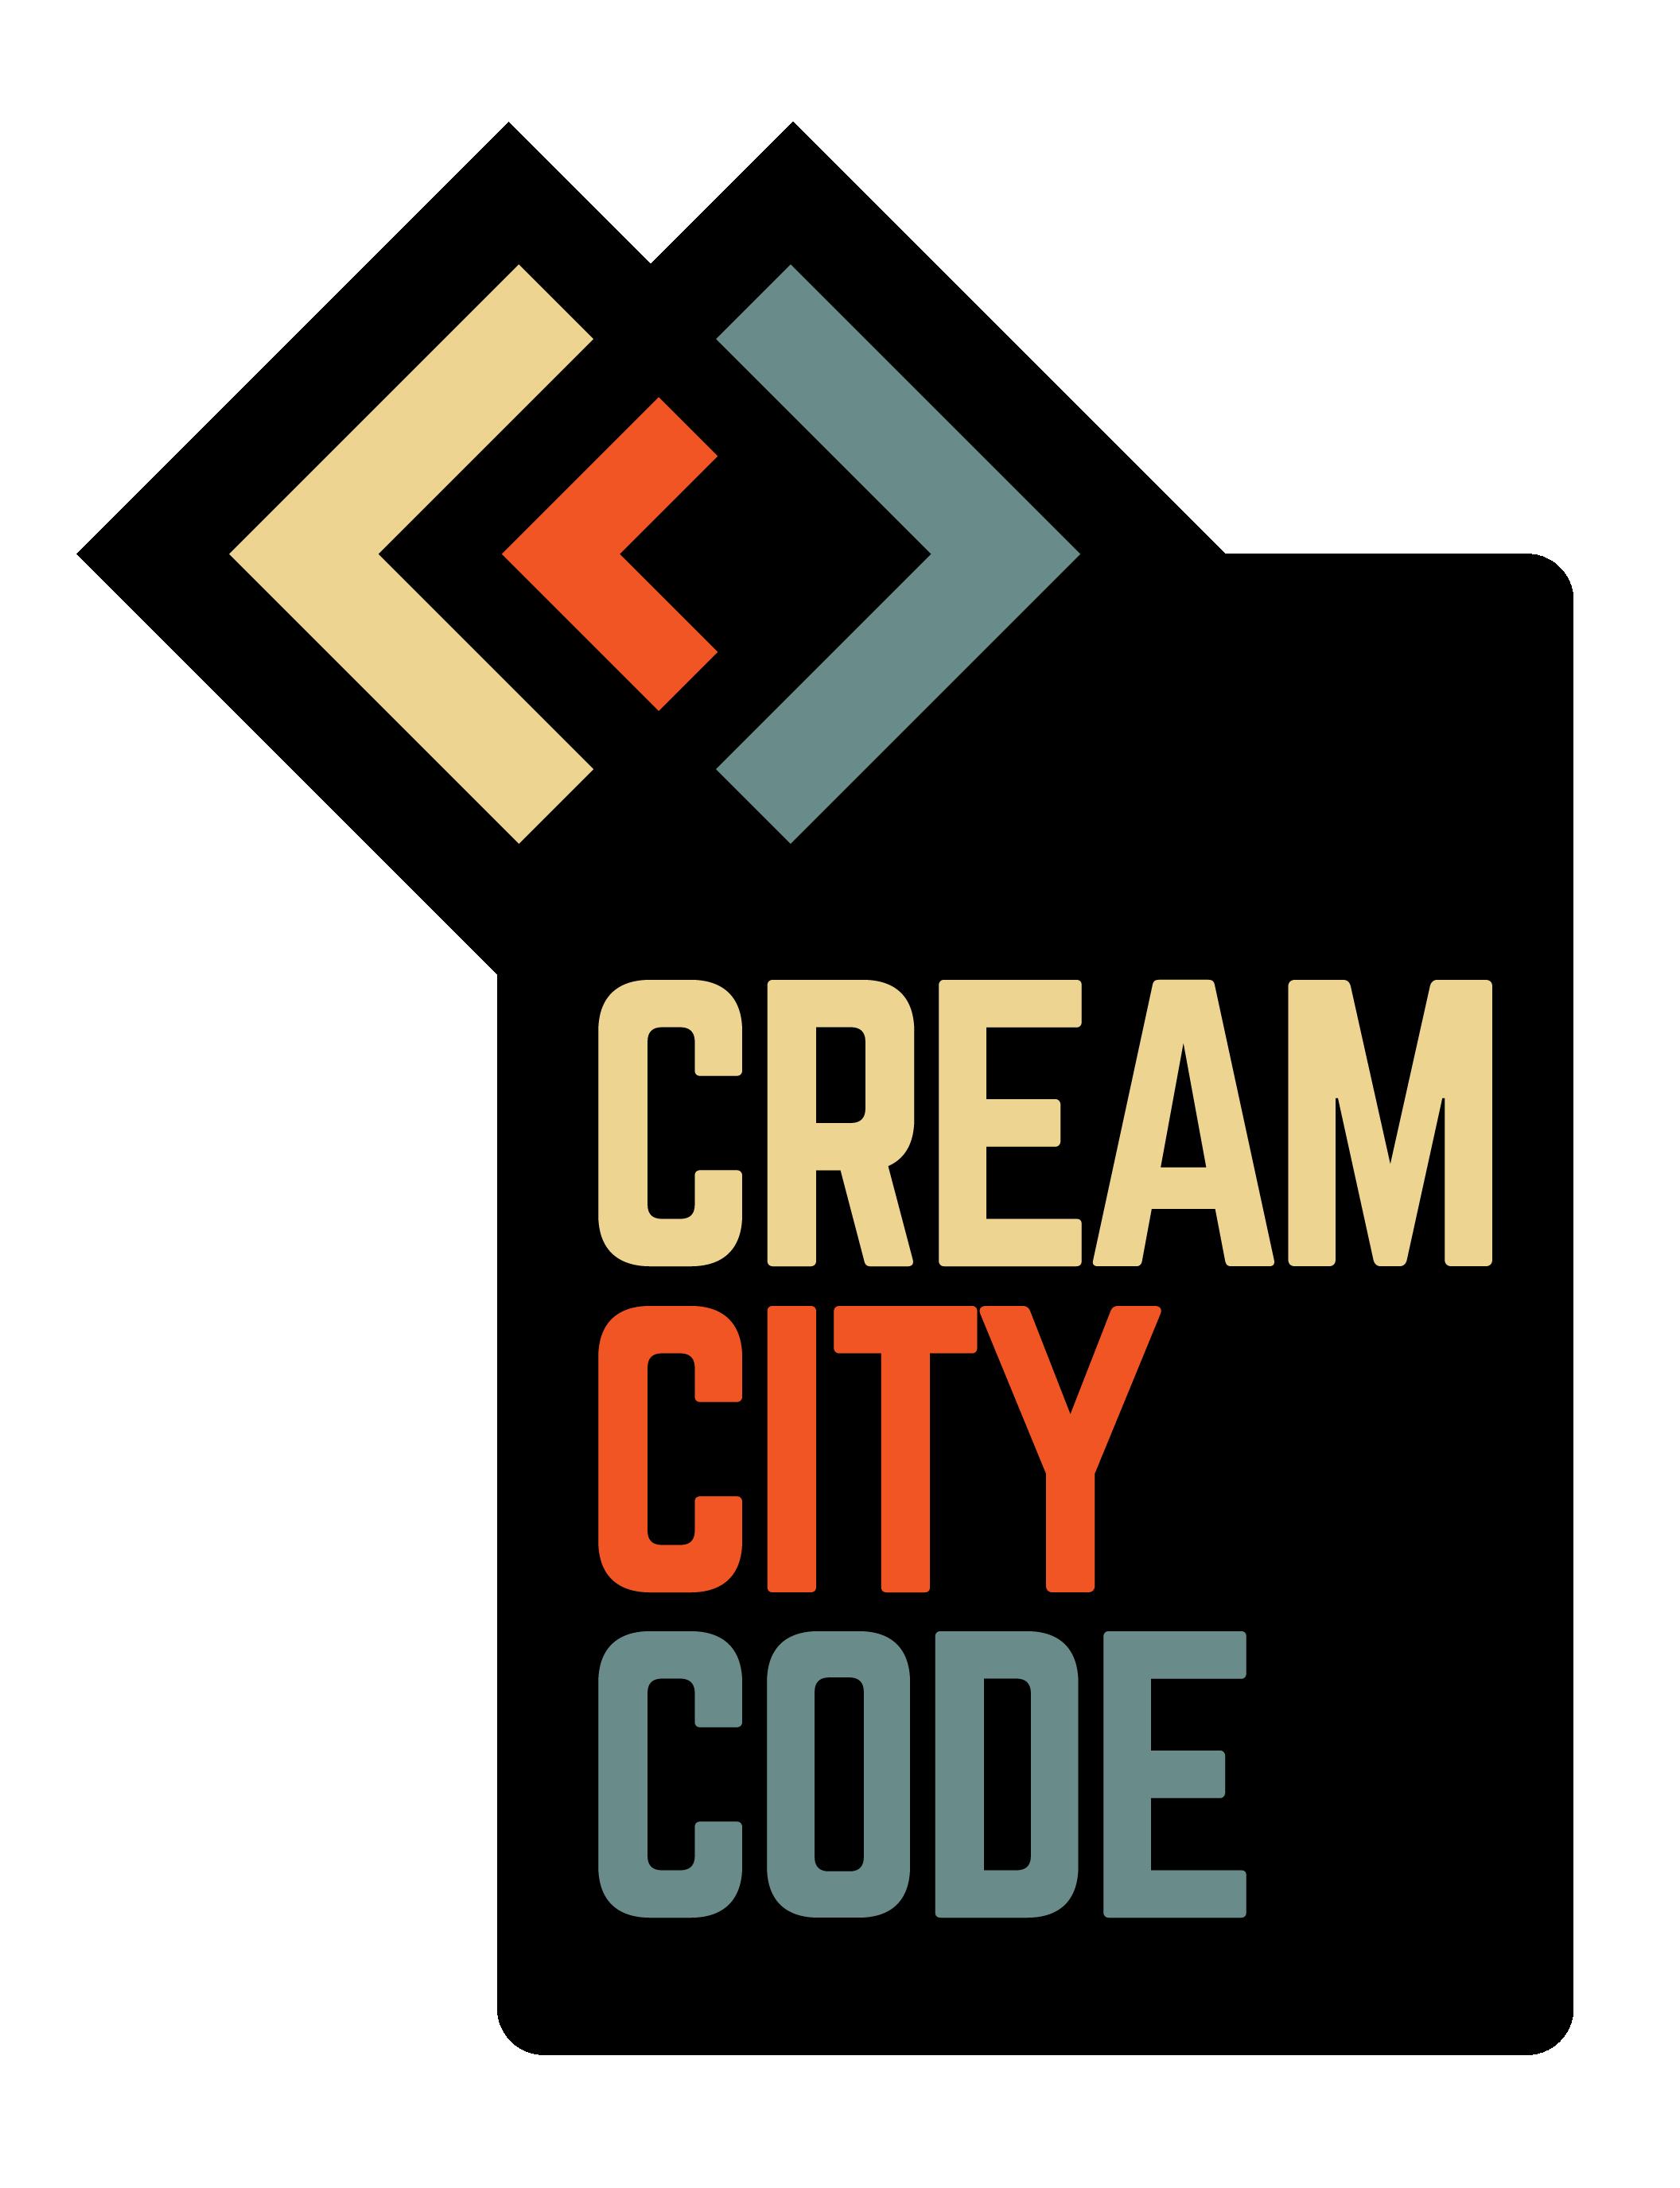 Cream City Code